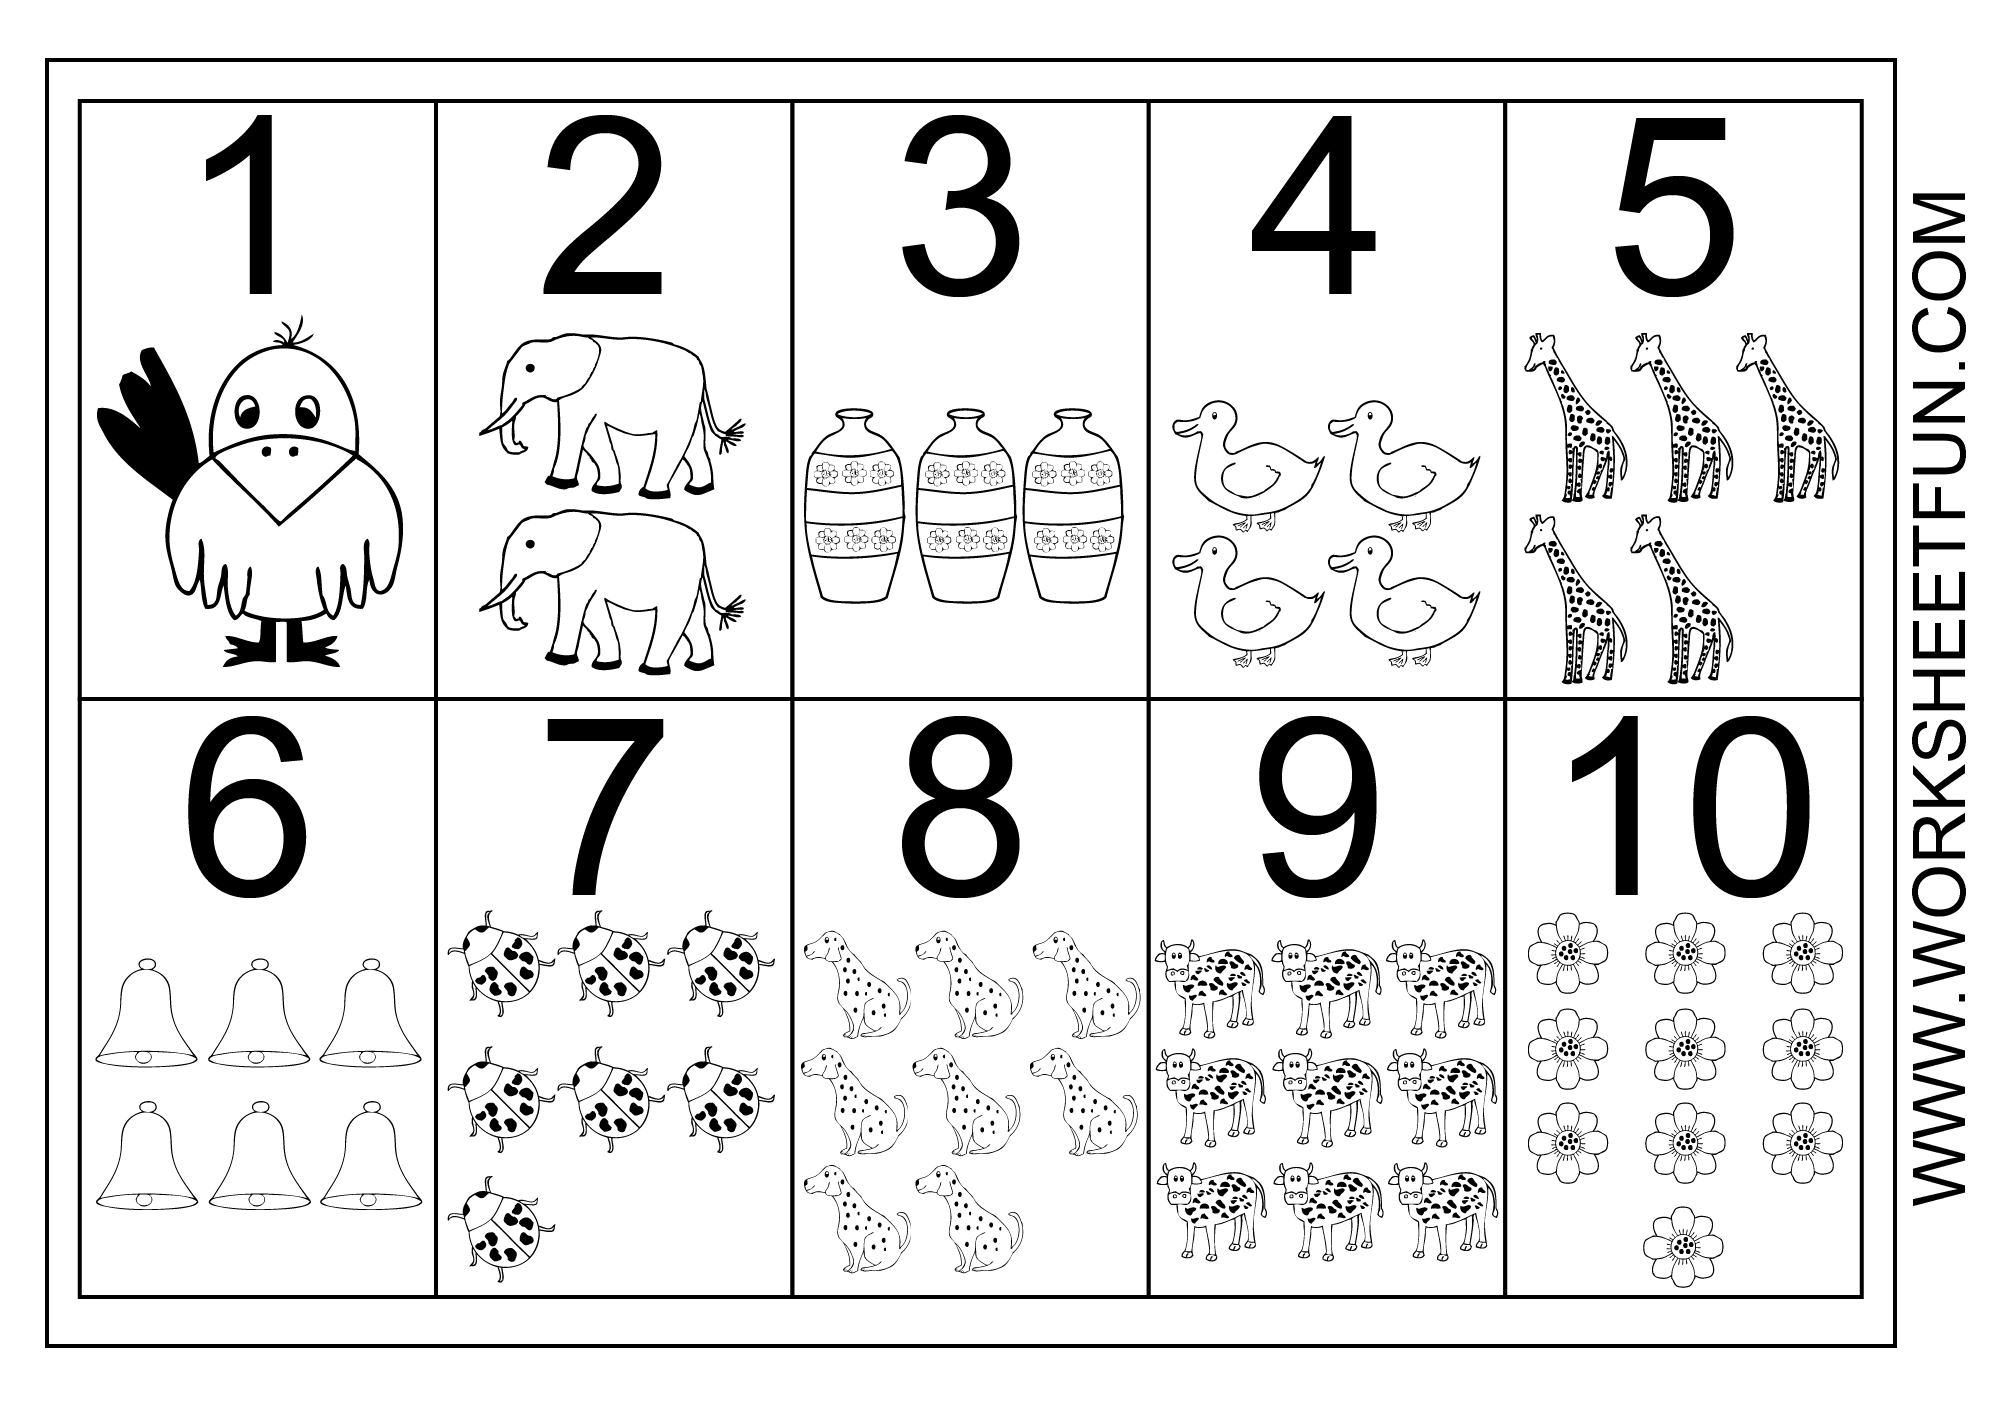 7 Images of Free Printable Worksheets Numbers 1-10